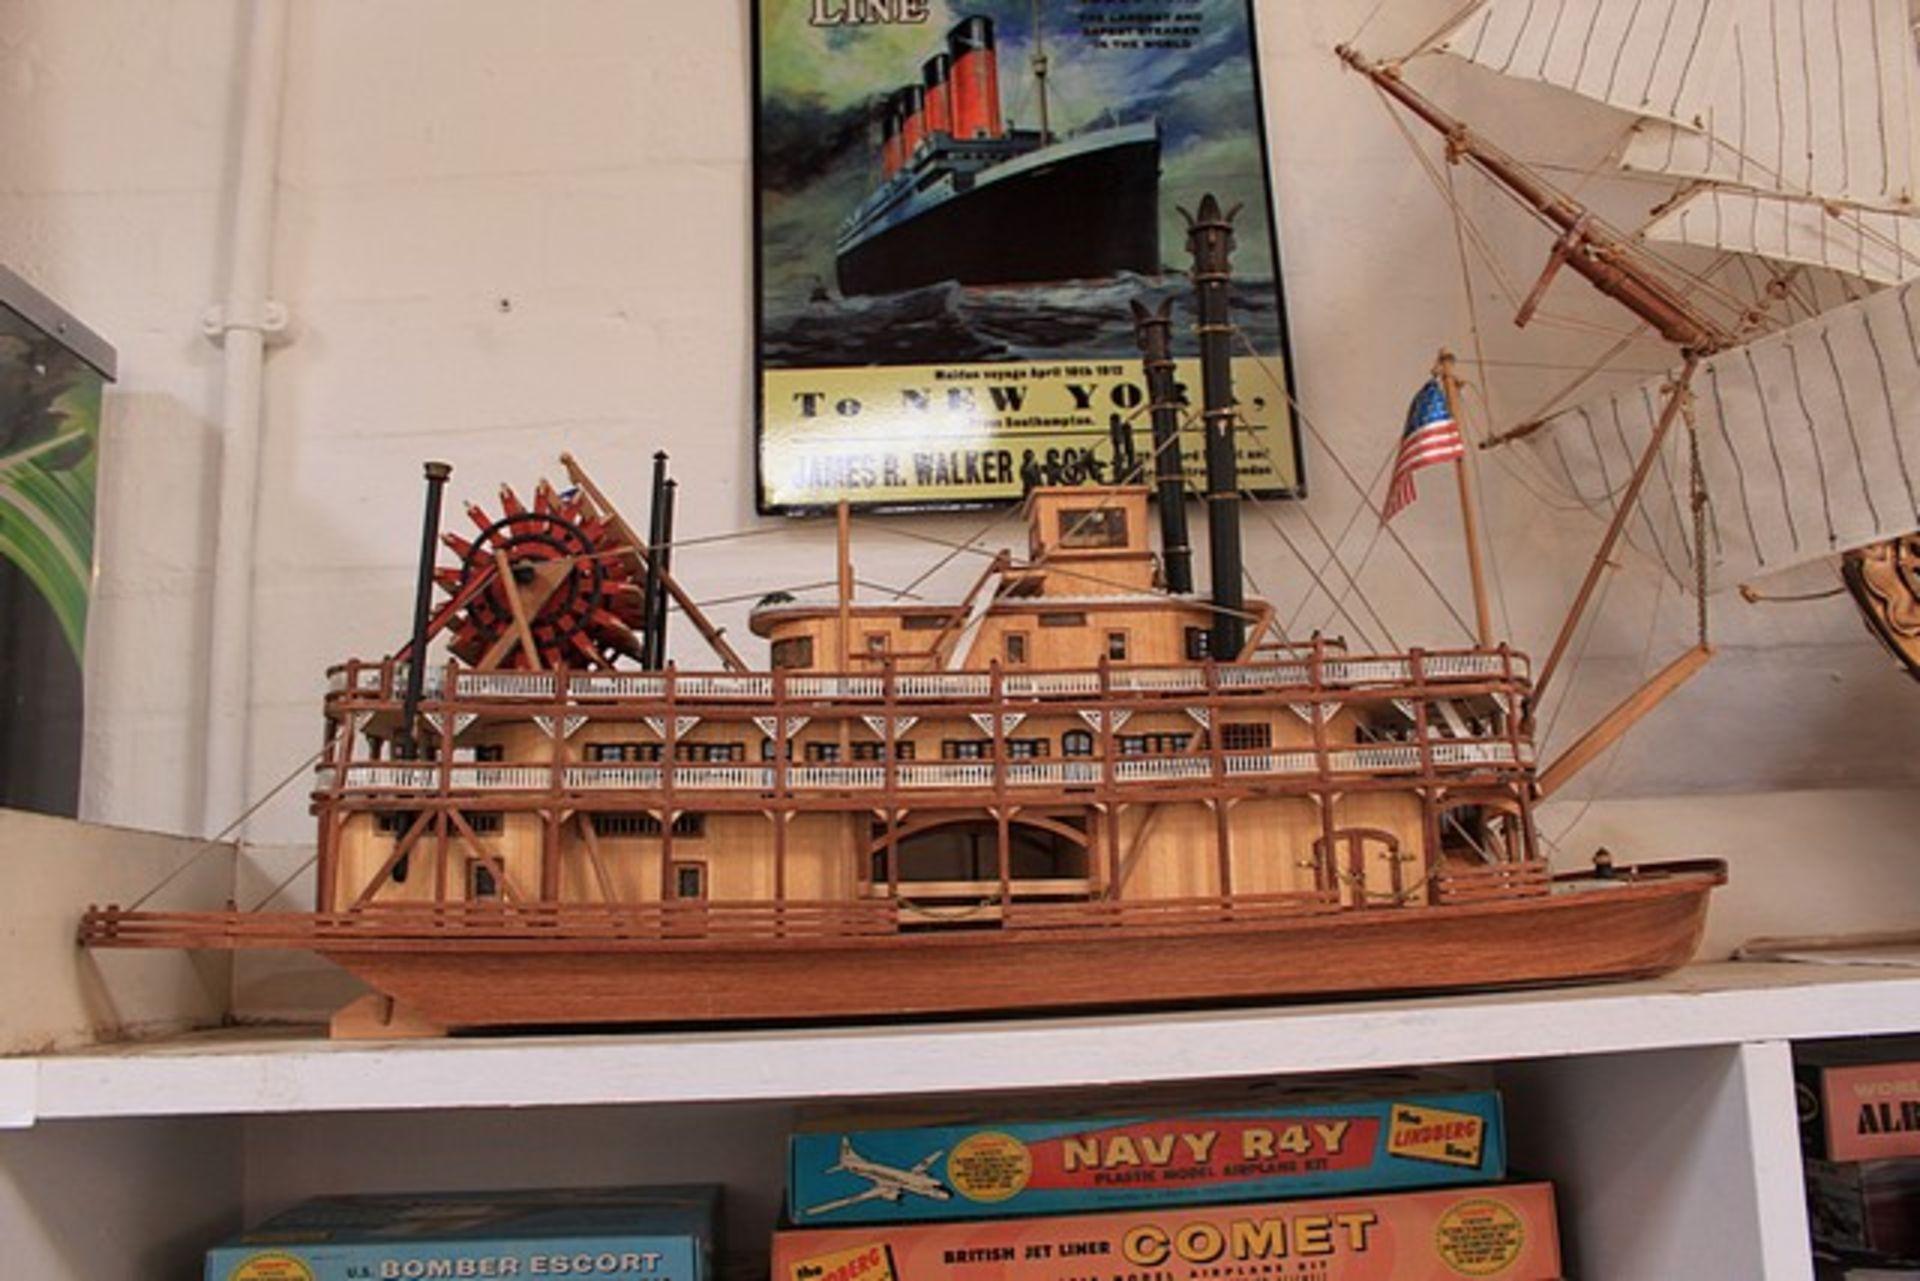 Lot 147 - Museum Quality Craftsman Built Artesania Latina 020505- Detailed Wooden Paddle Steam Ship